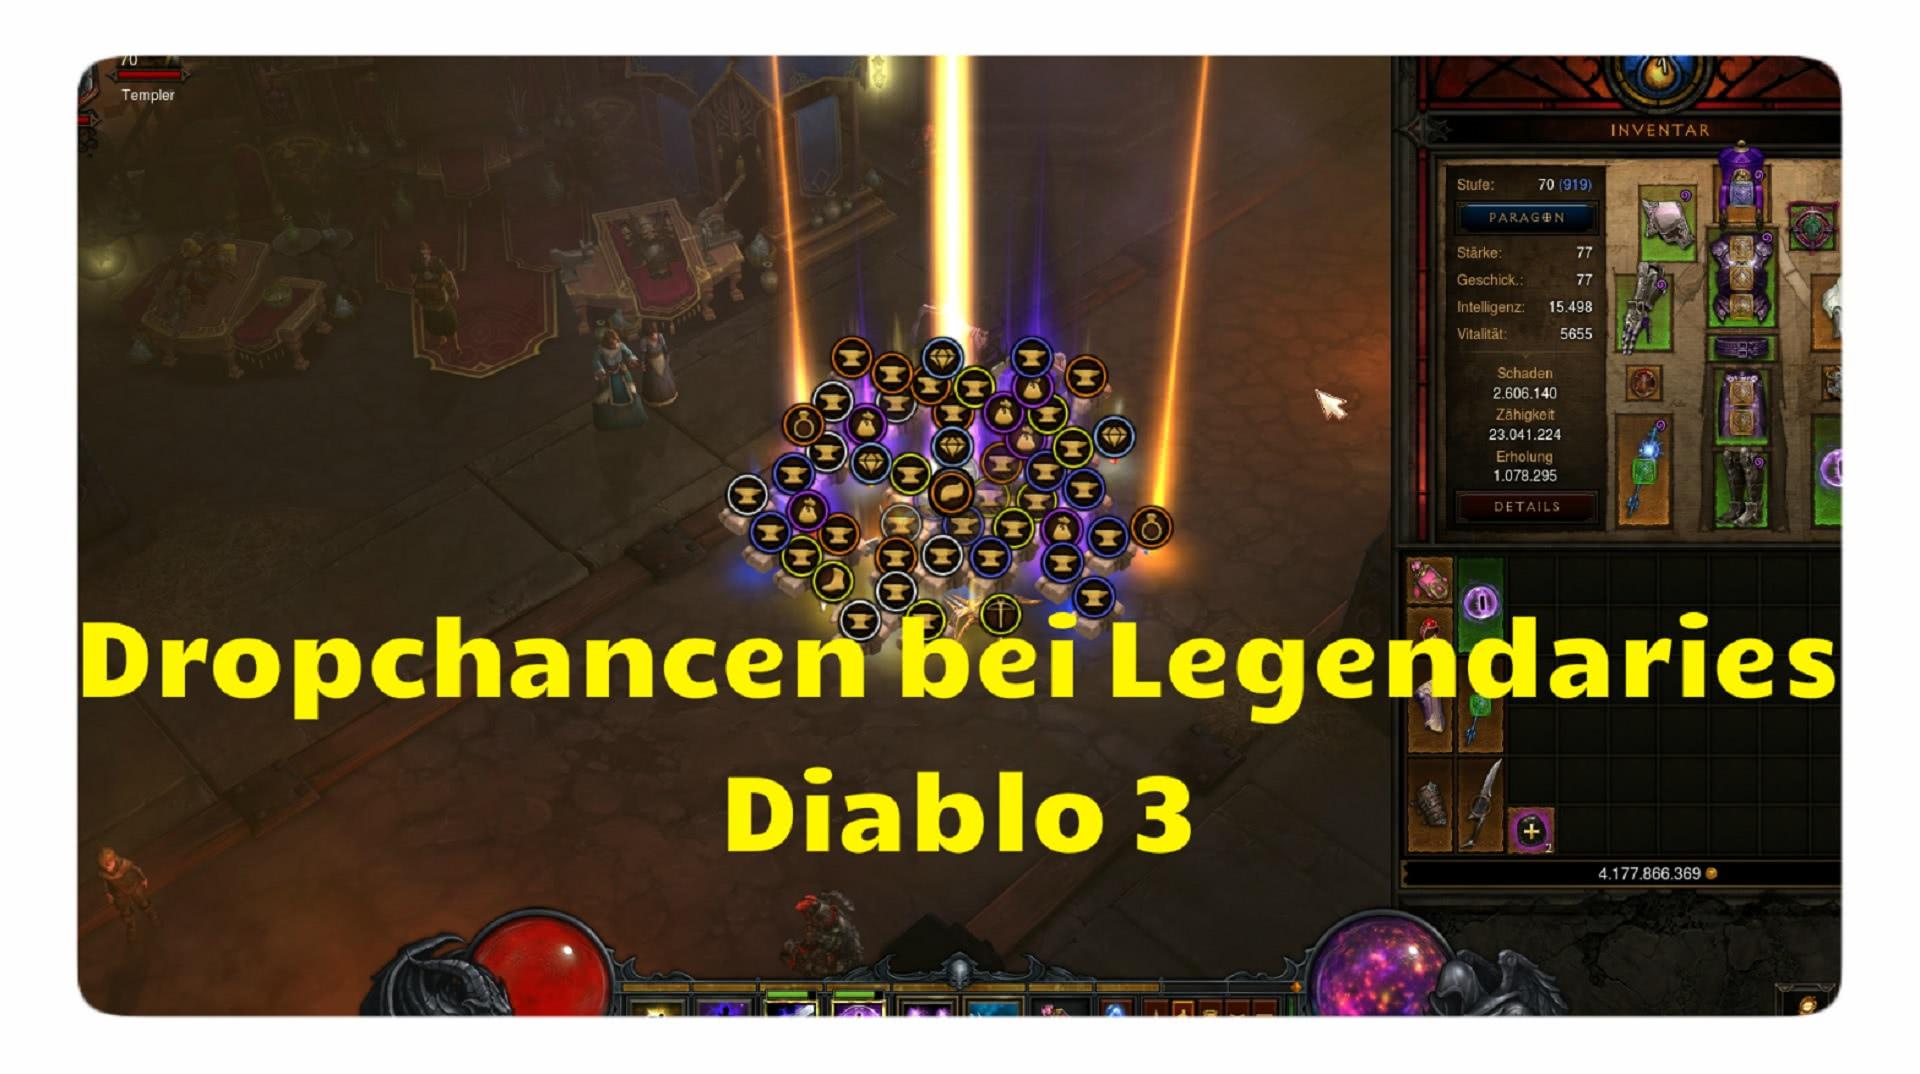 Dropchancen bei Legendaries